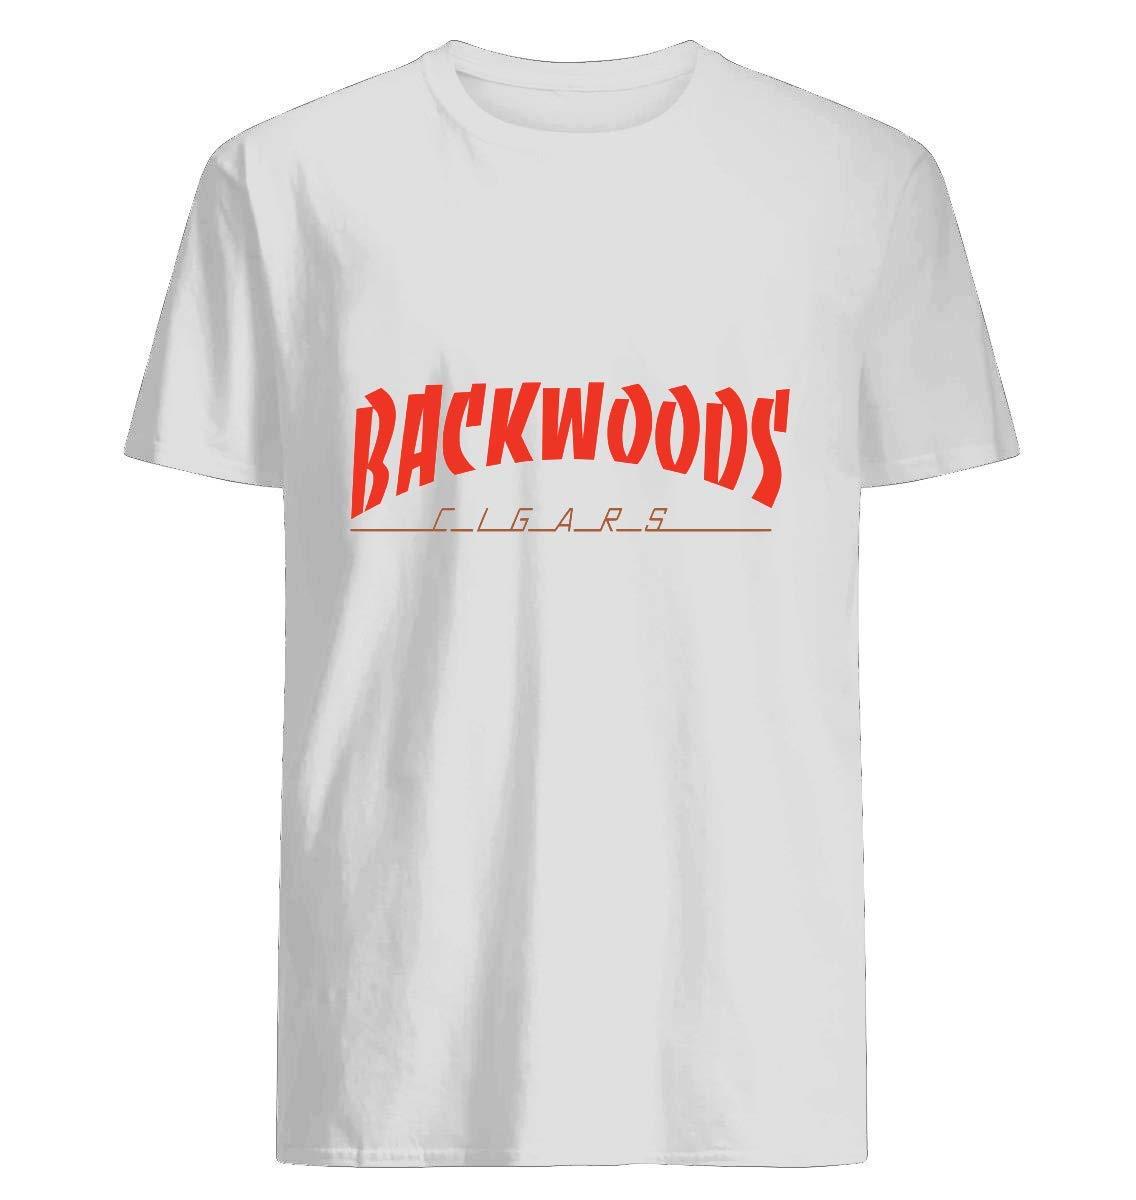 Backwoods Cigars T Shirt For Unisex